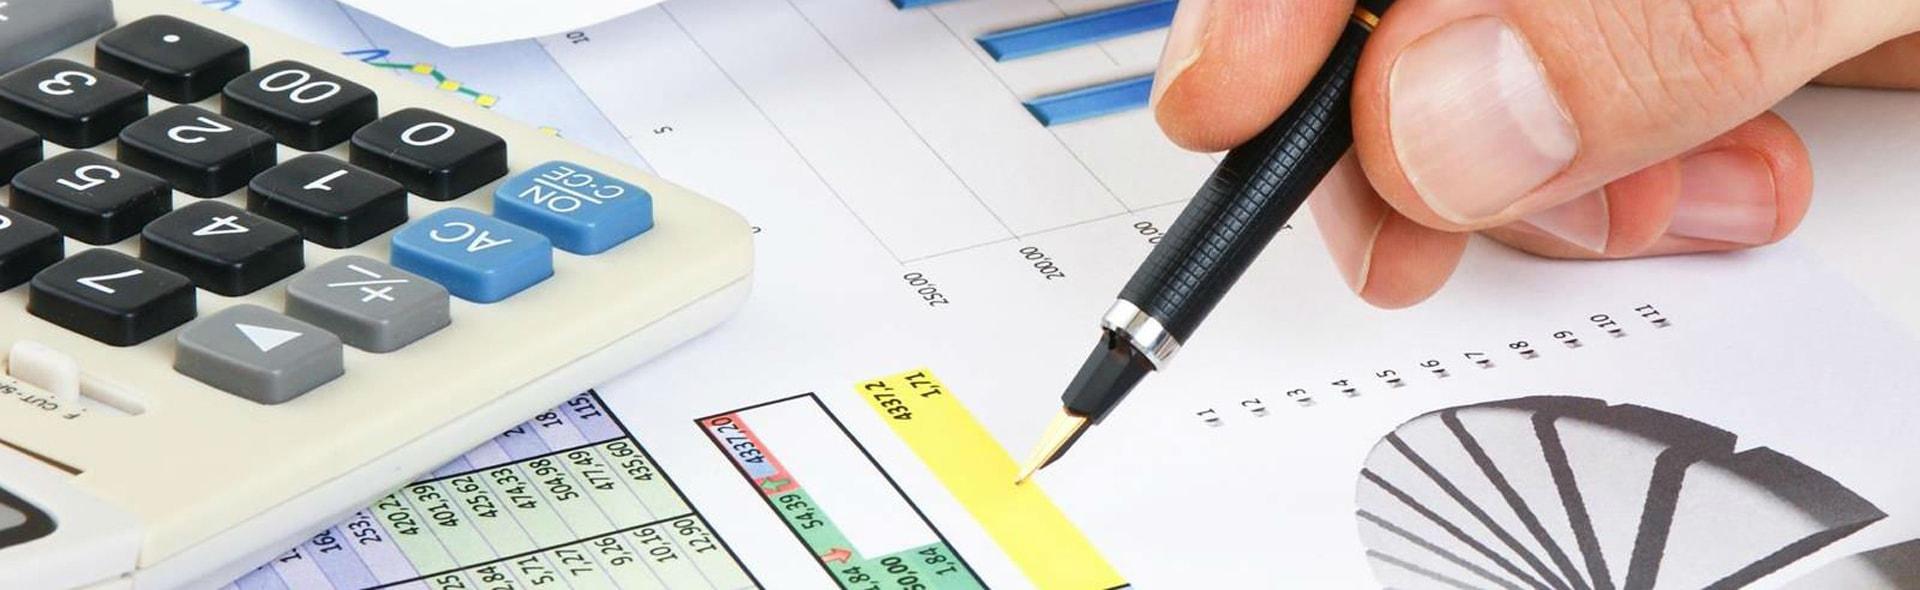 Účtovníctvo s pridanou hodnotou